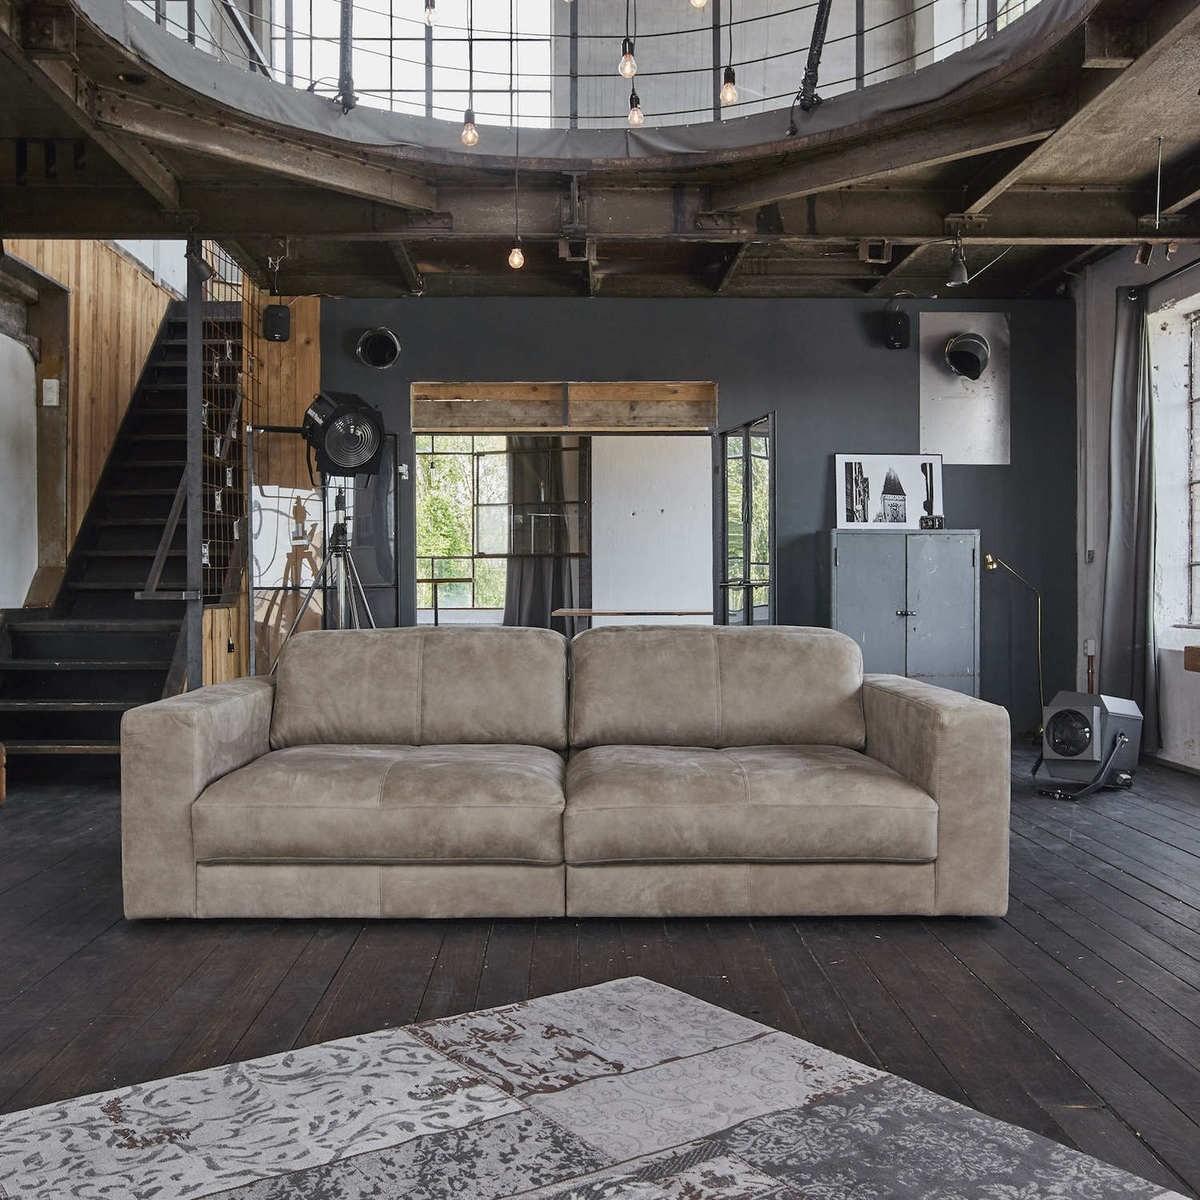 Full Size of Leder Couch Cognac 3 Sitzer Sofa Ikea Koinor Pflege Ledersofa Kaufen Chesterfield Leather Set Braun Gebraucht 3er Hausmittel Vintage Ecksofa 2 Gigant 4 295cm Sofa Leder Sofa